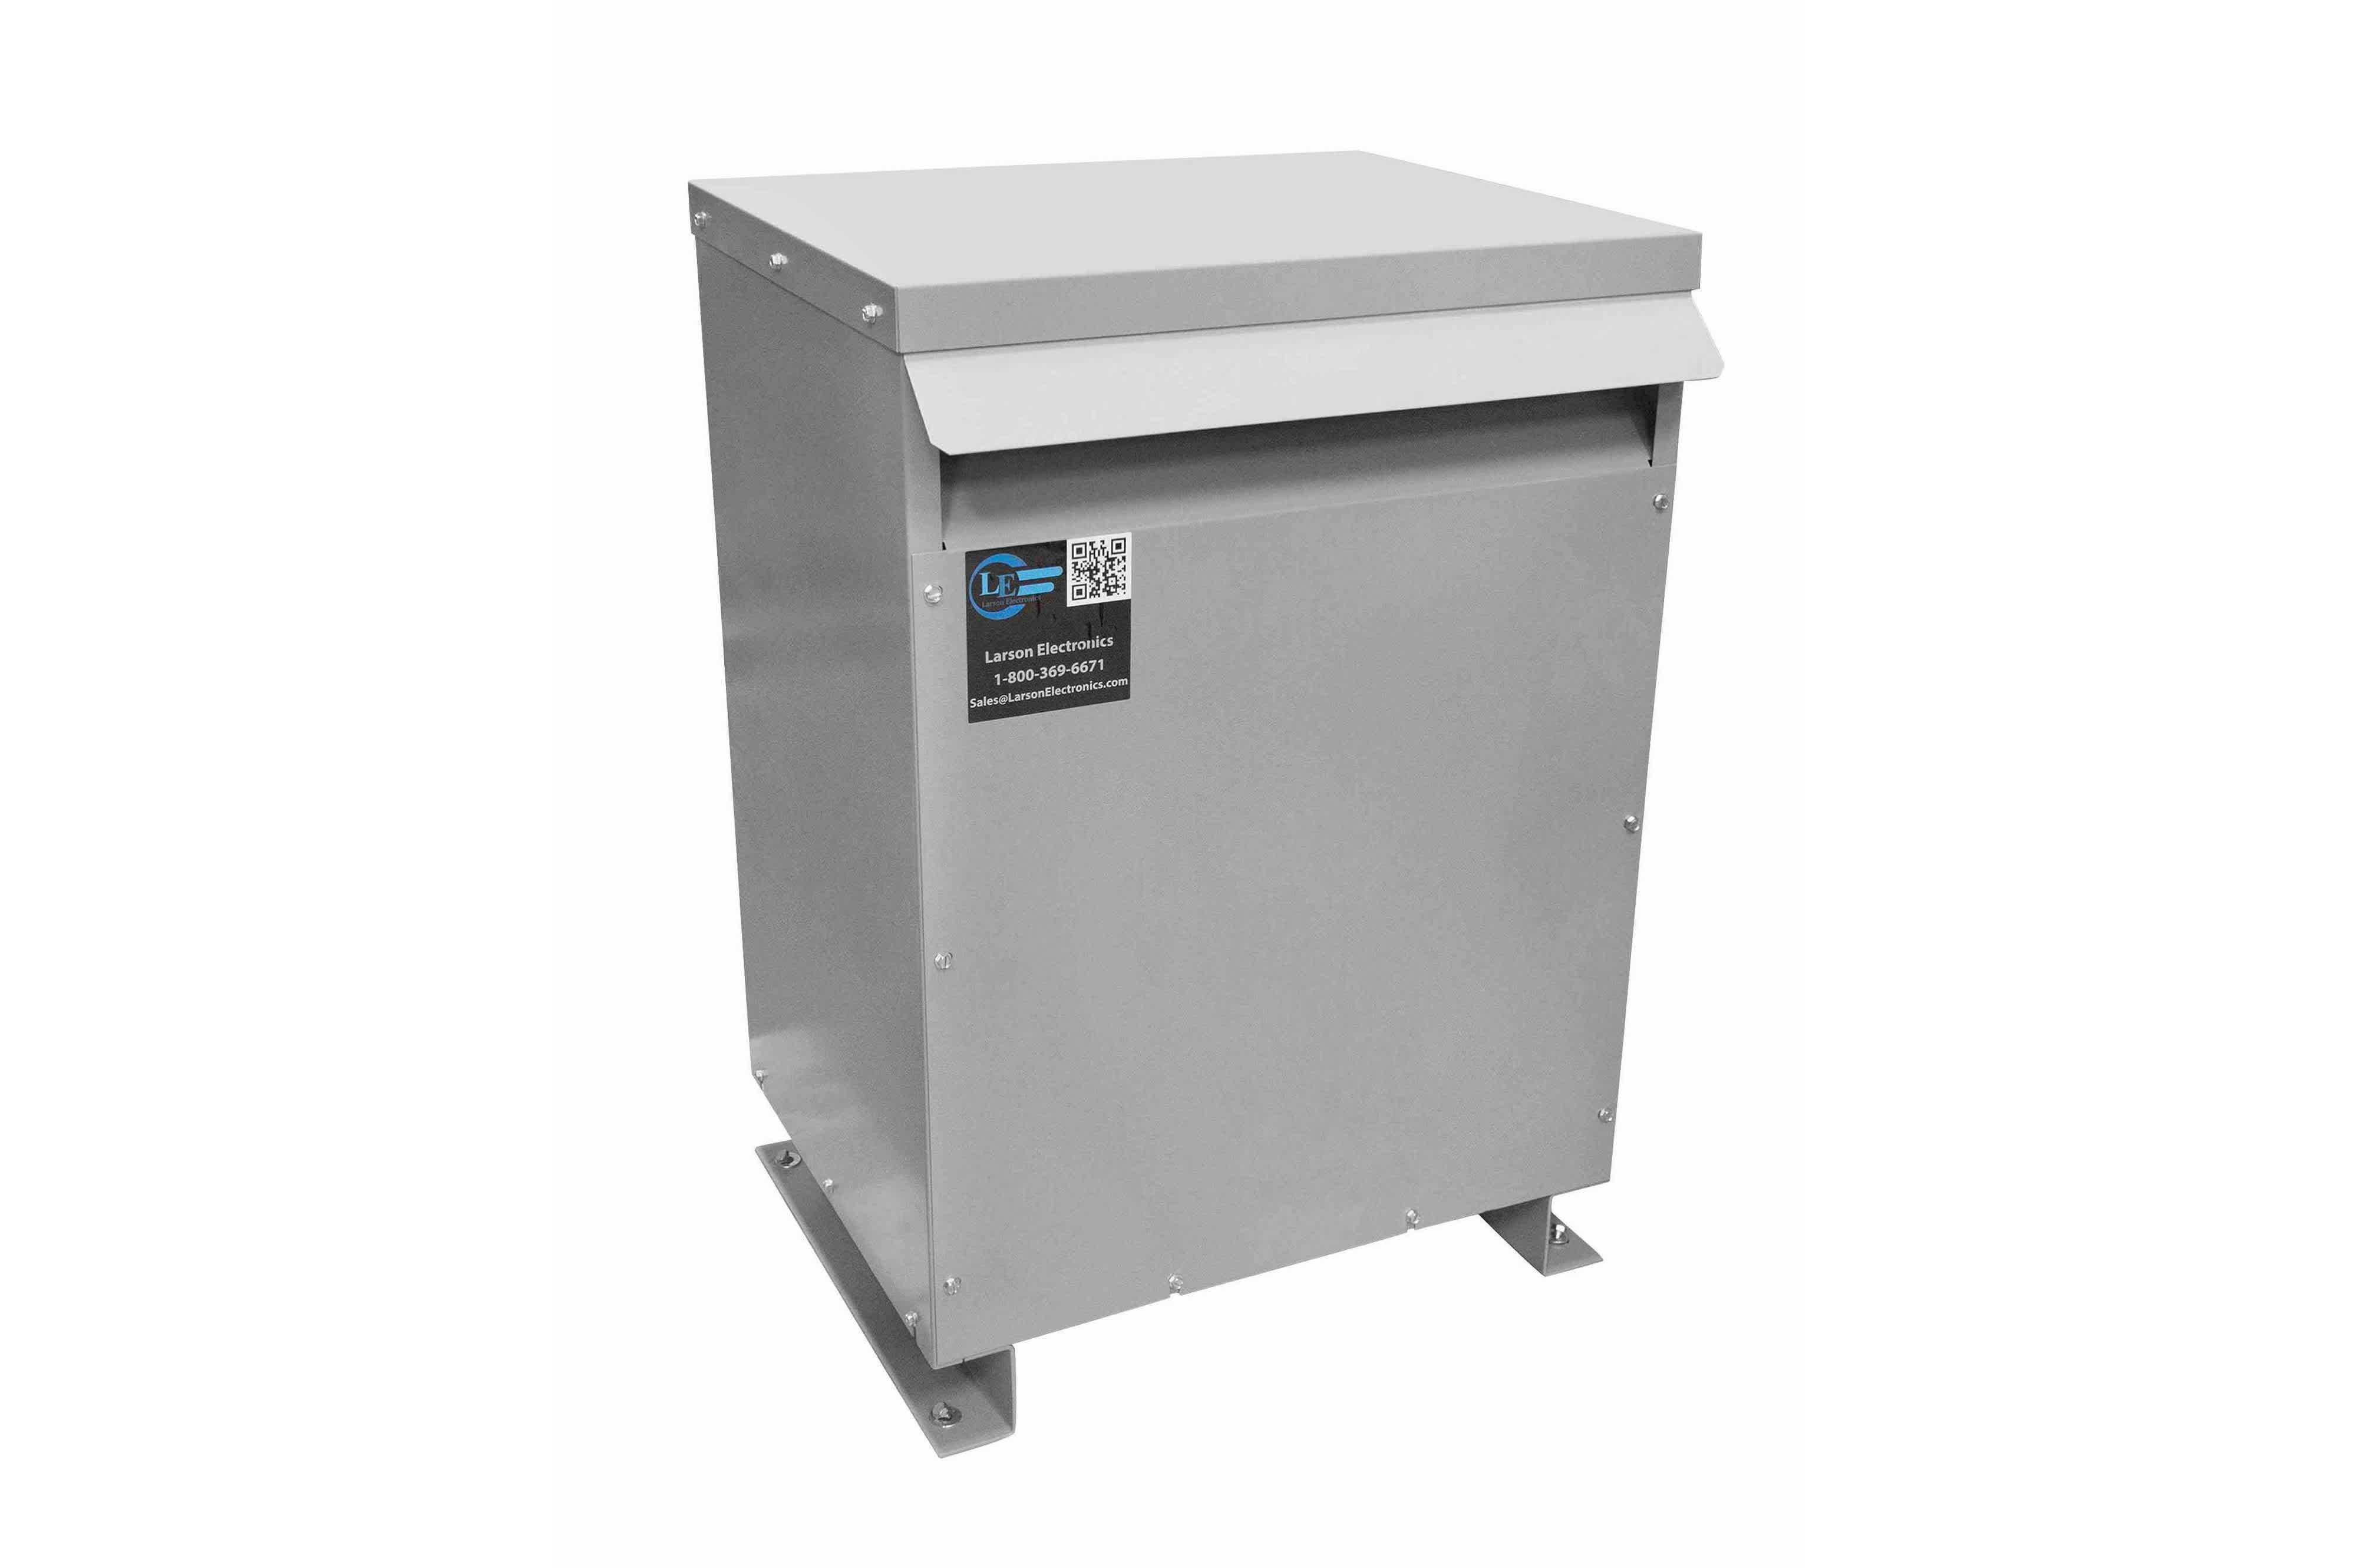 45 kVA 3PH Isolation Transformer, 575V Wye Primary, 400Y/231 Wye-N Secondary, N3R, Ventilated, 60 Hz